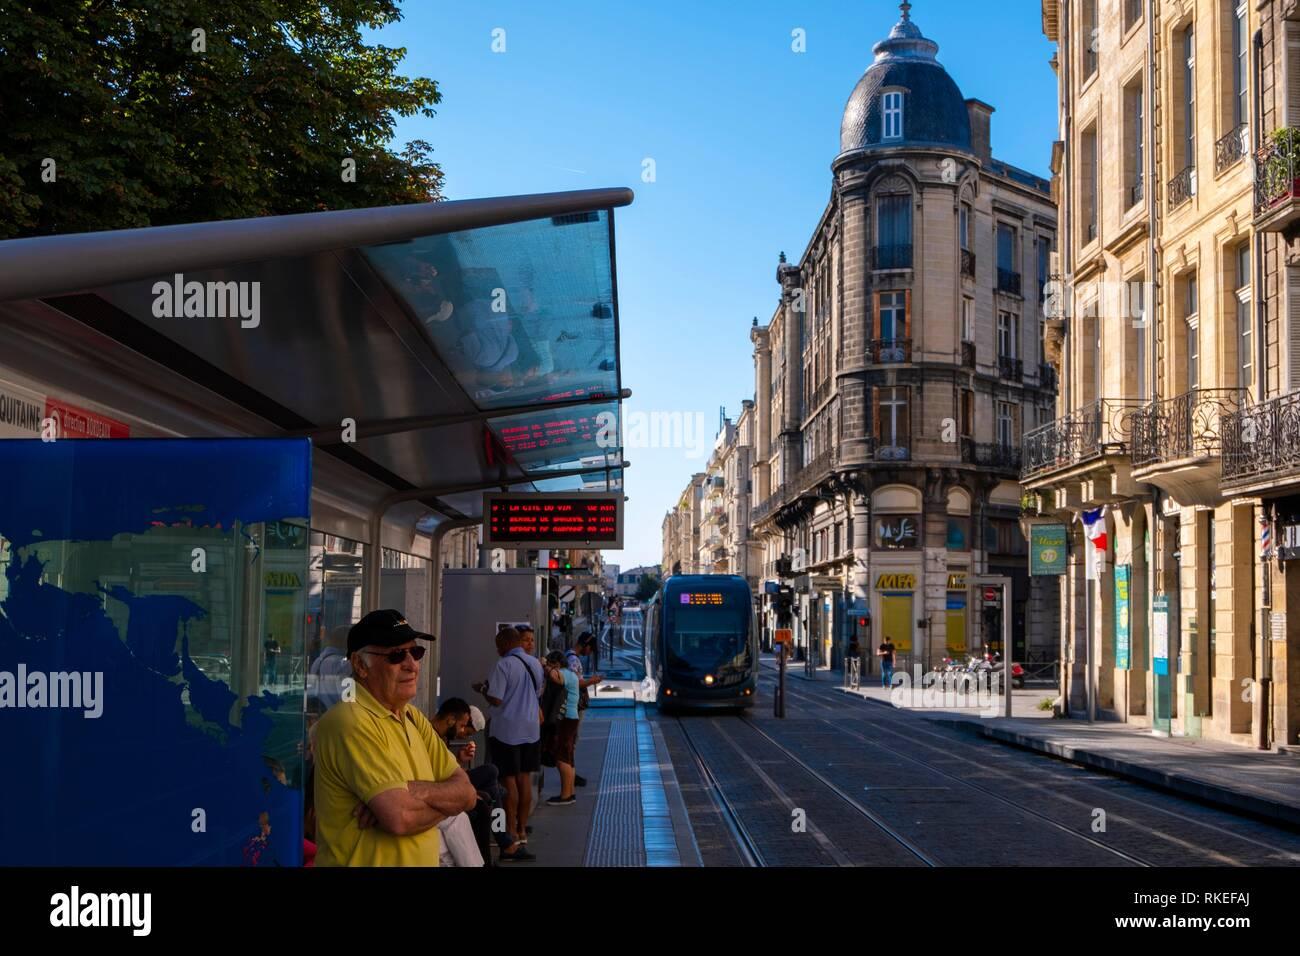 France, Nouvelle Aquitaine, Gironde, Tram on Cours Pateur at Bordeaux. - Stock Image